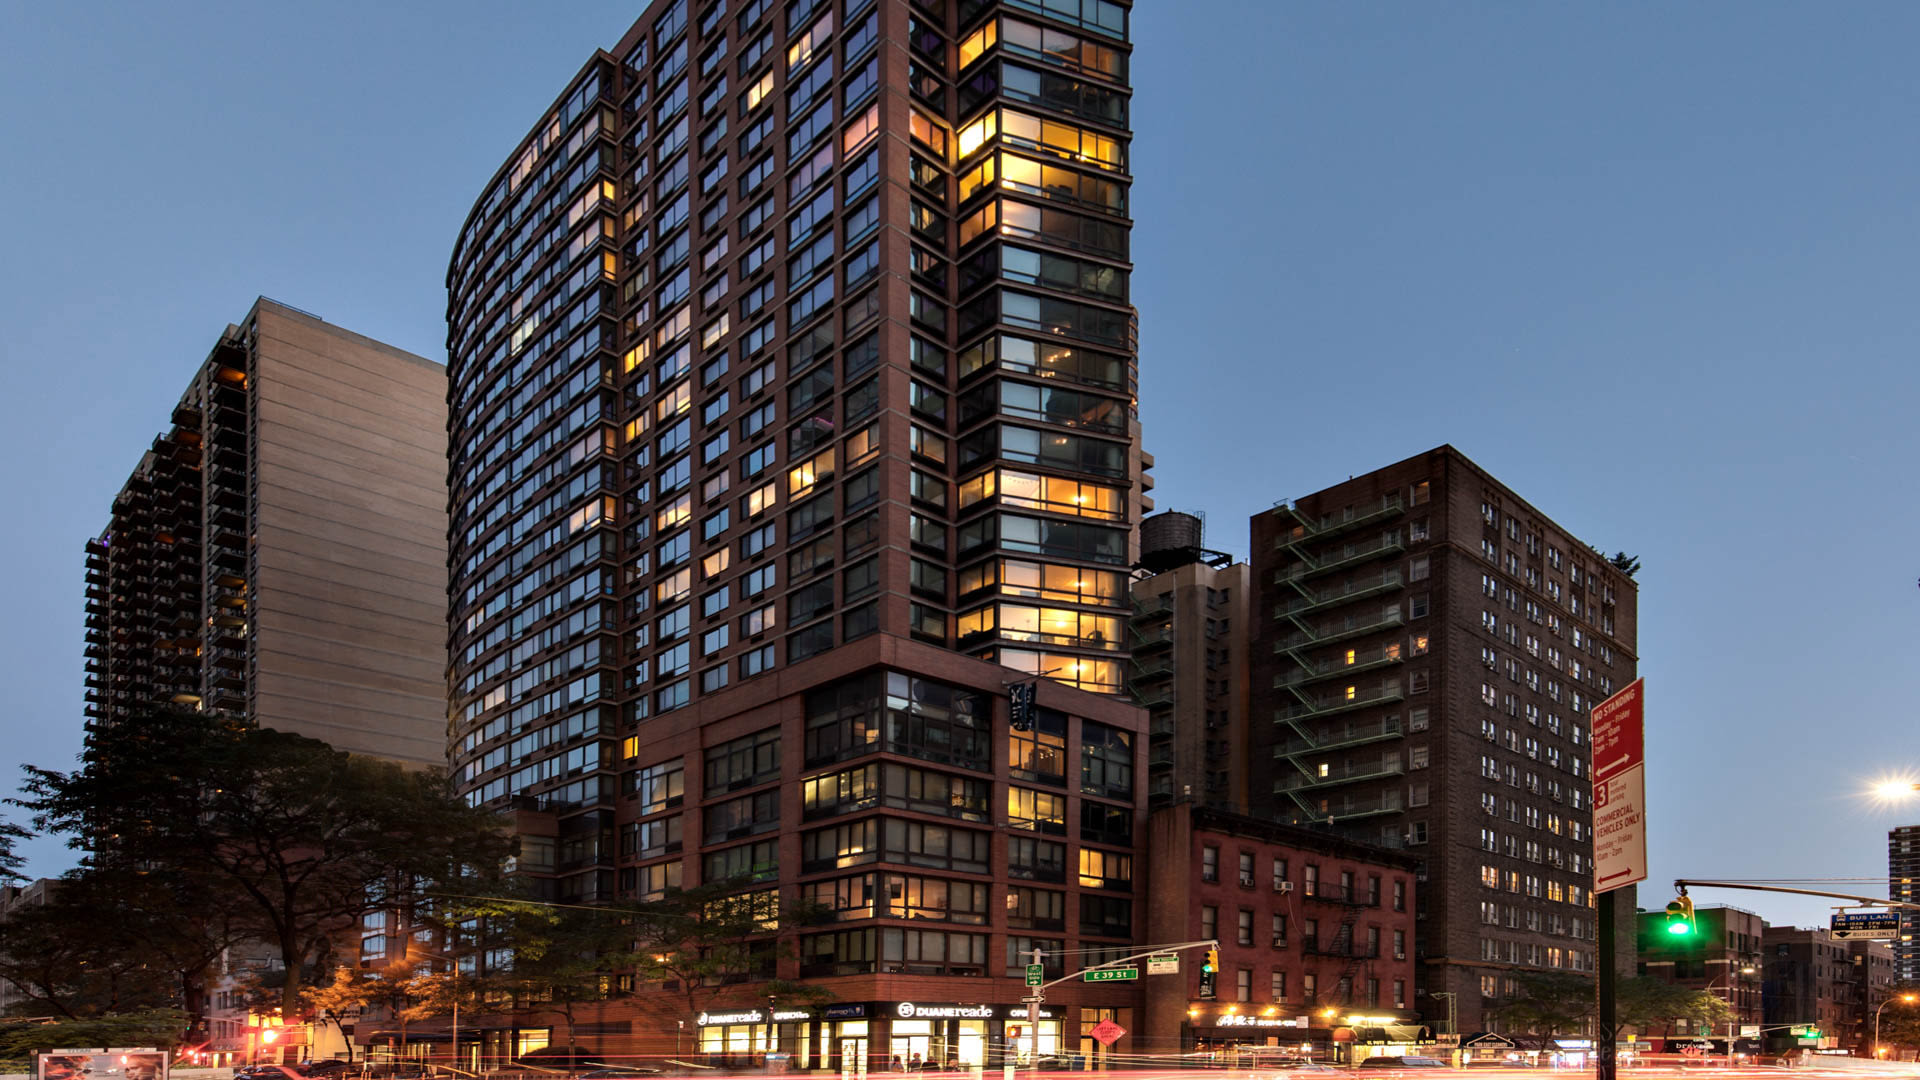 300 East 39th Apartments - Exterior